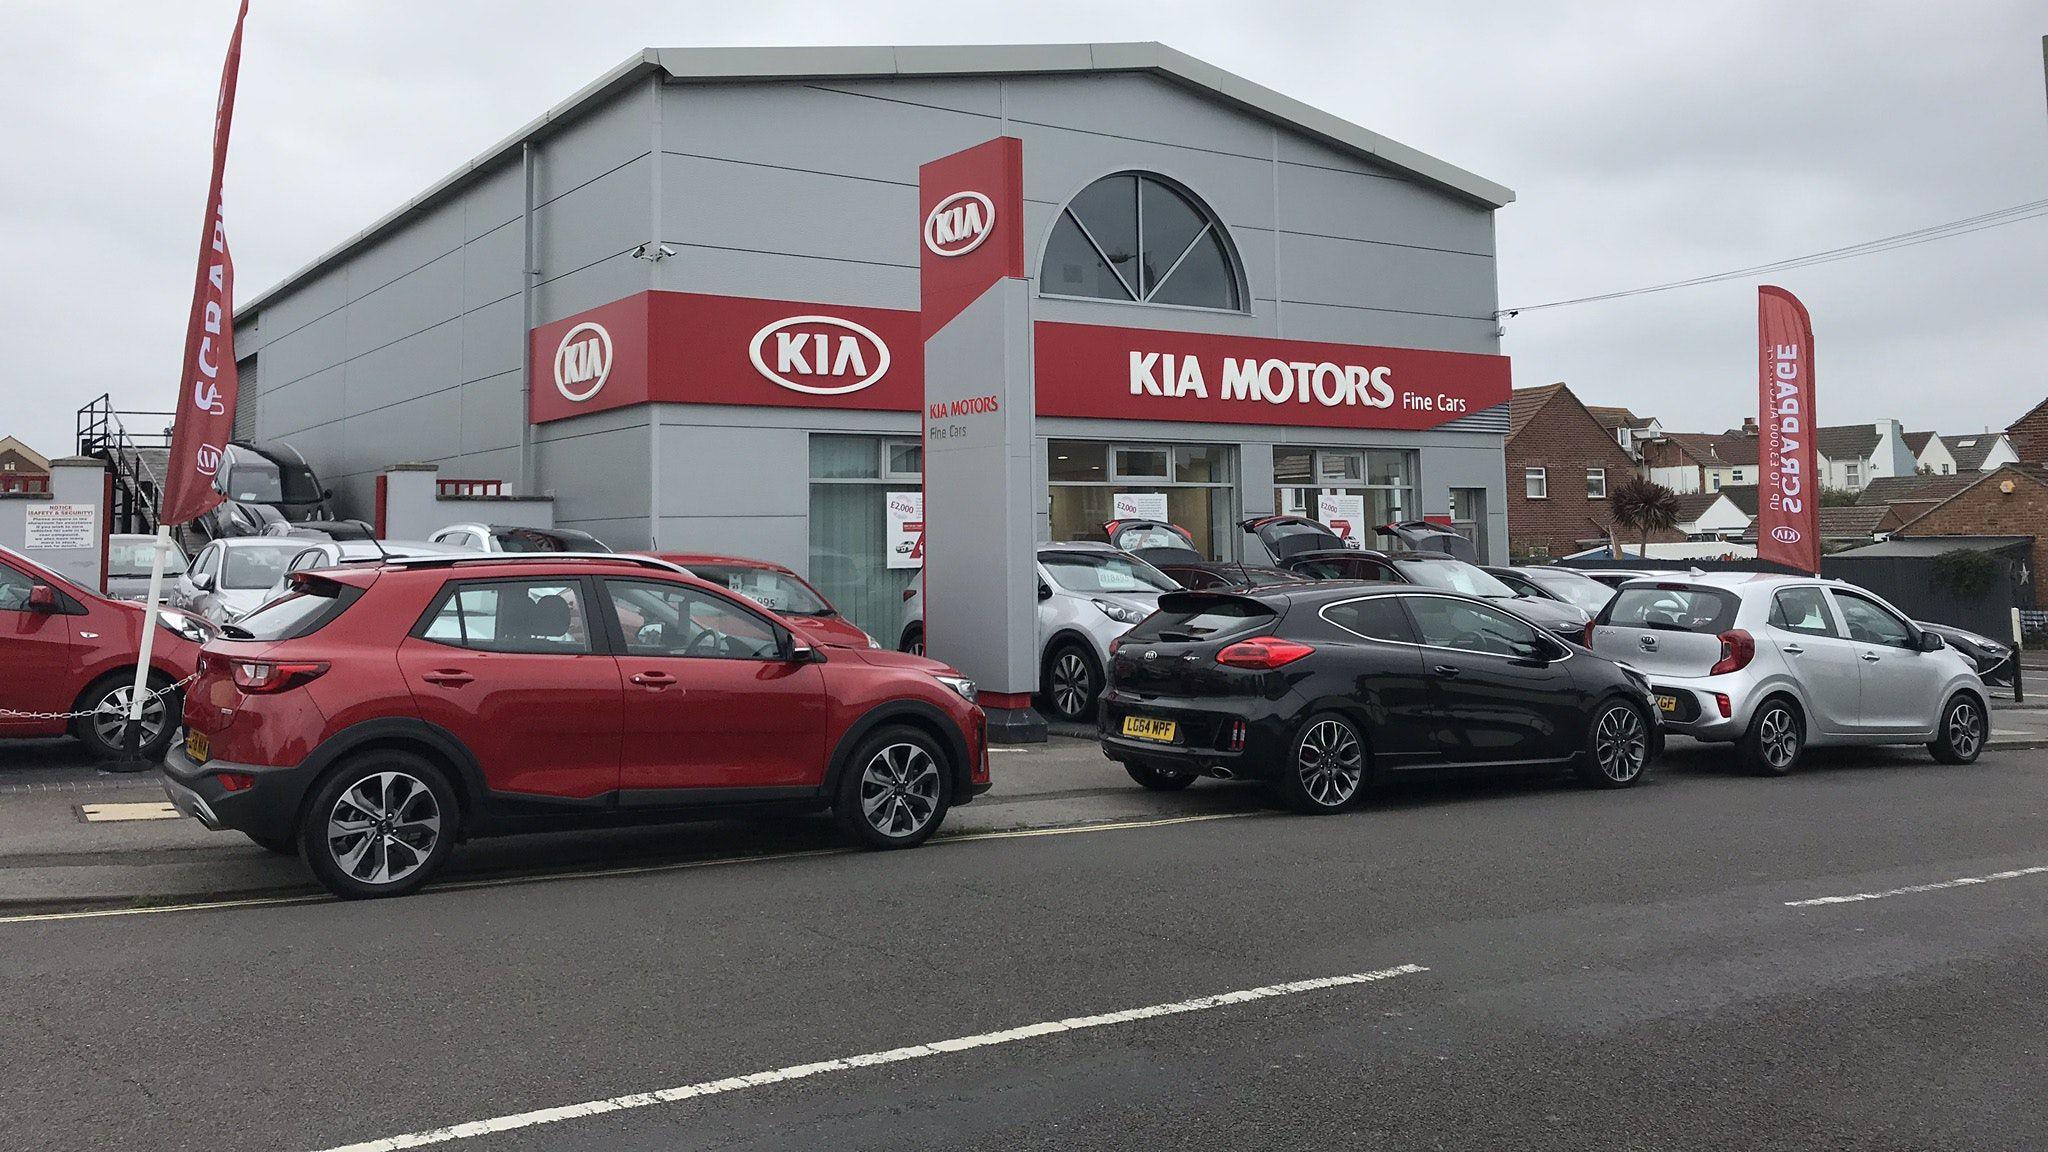 KIA Motors garage with cars outside